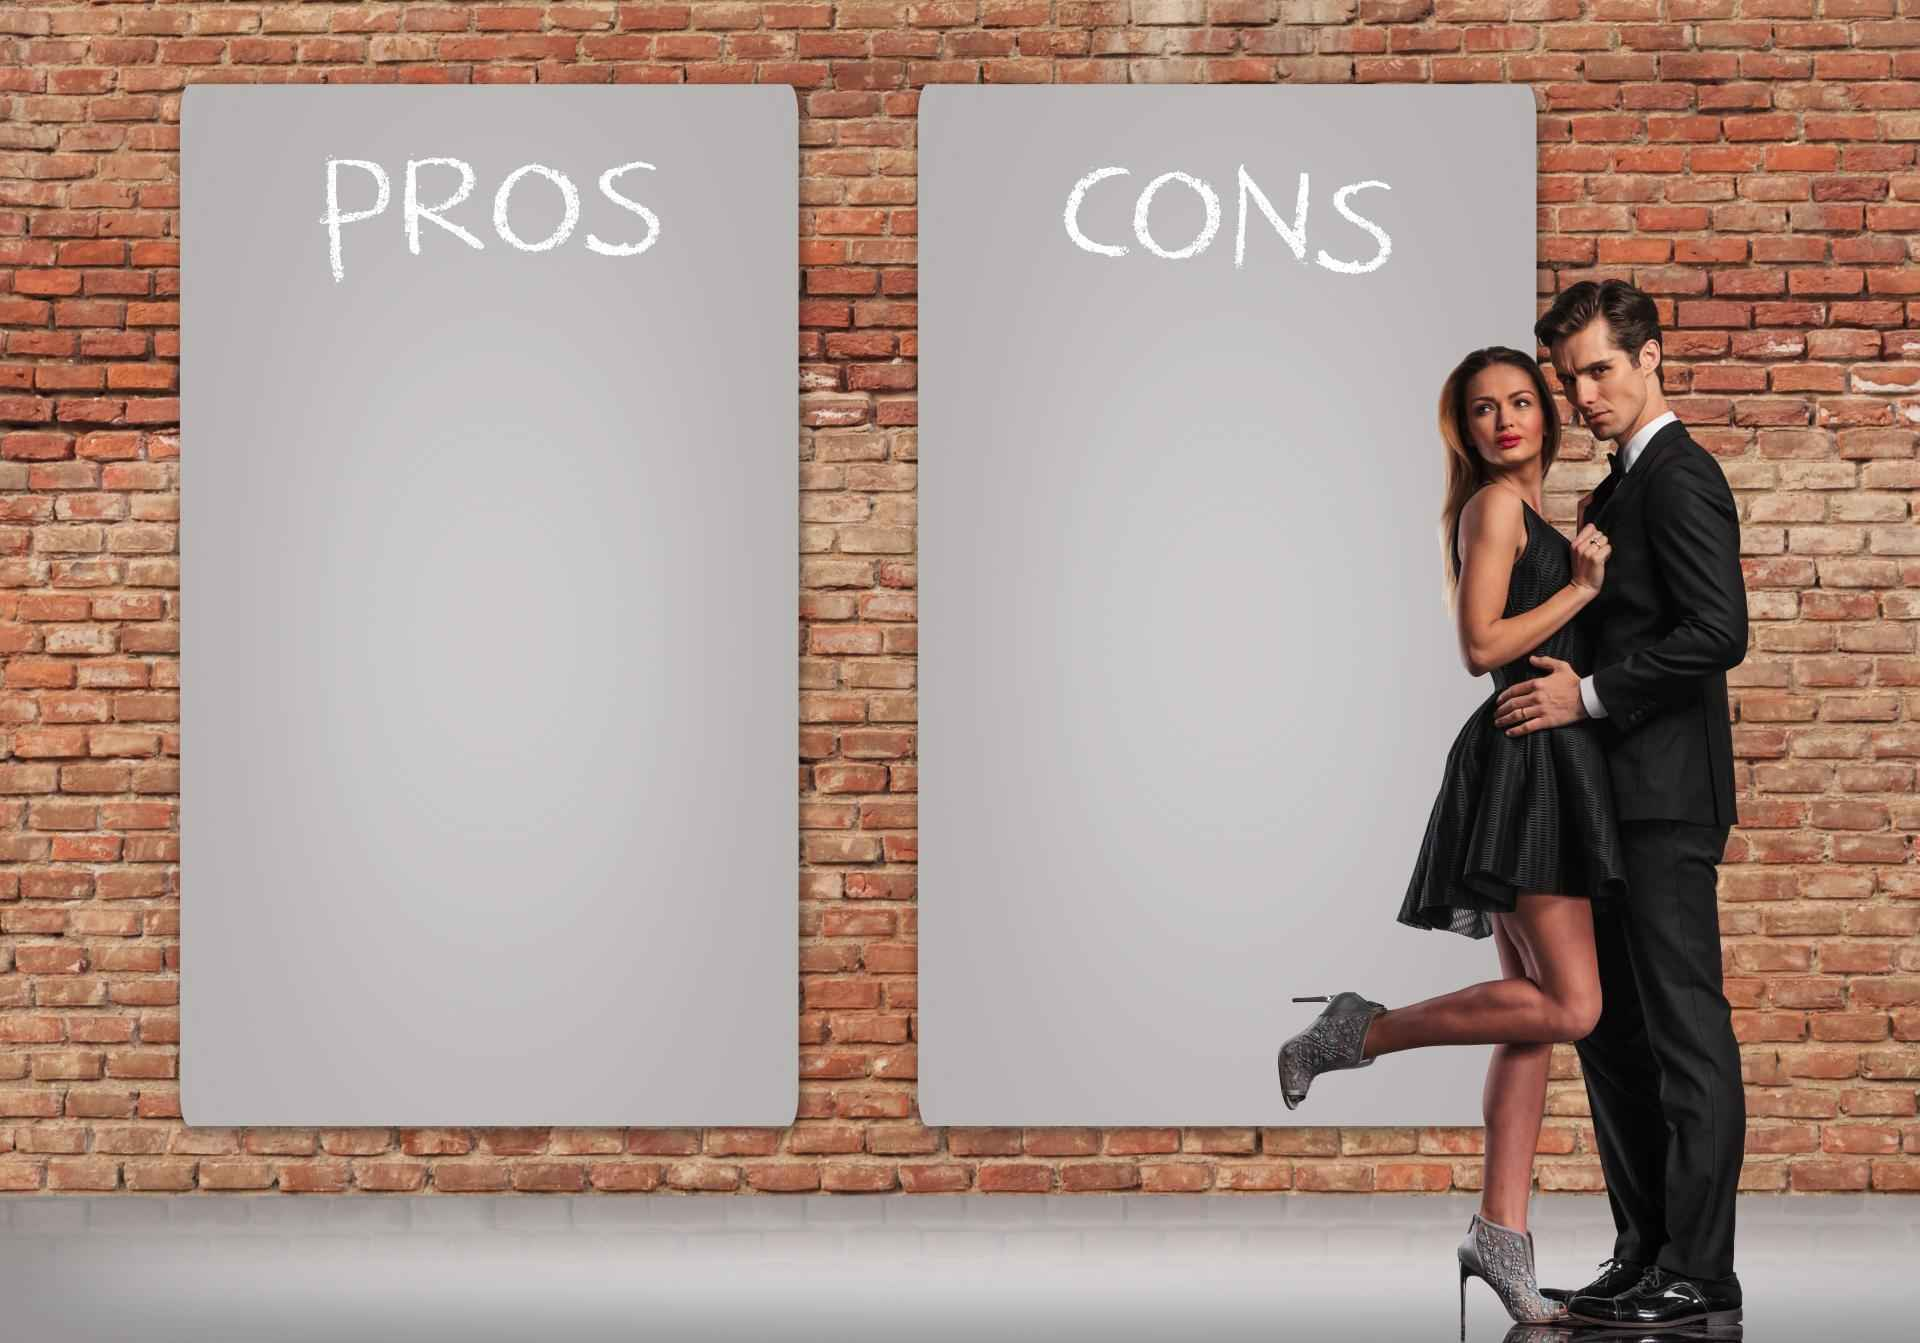 Sesso Occasionale: I pro e i contro SDC.com